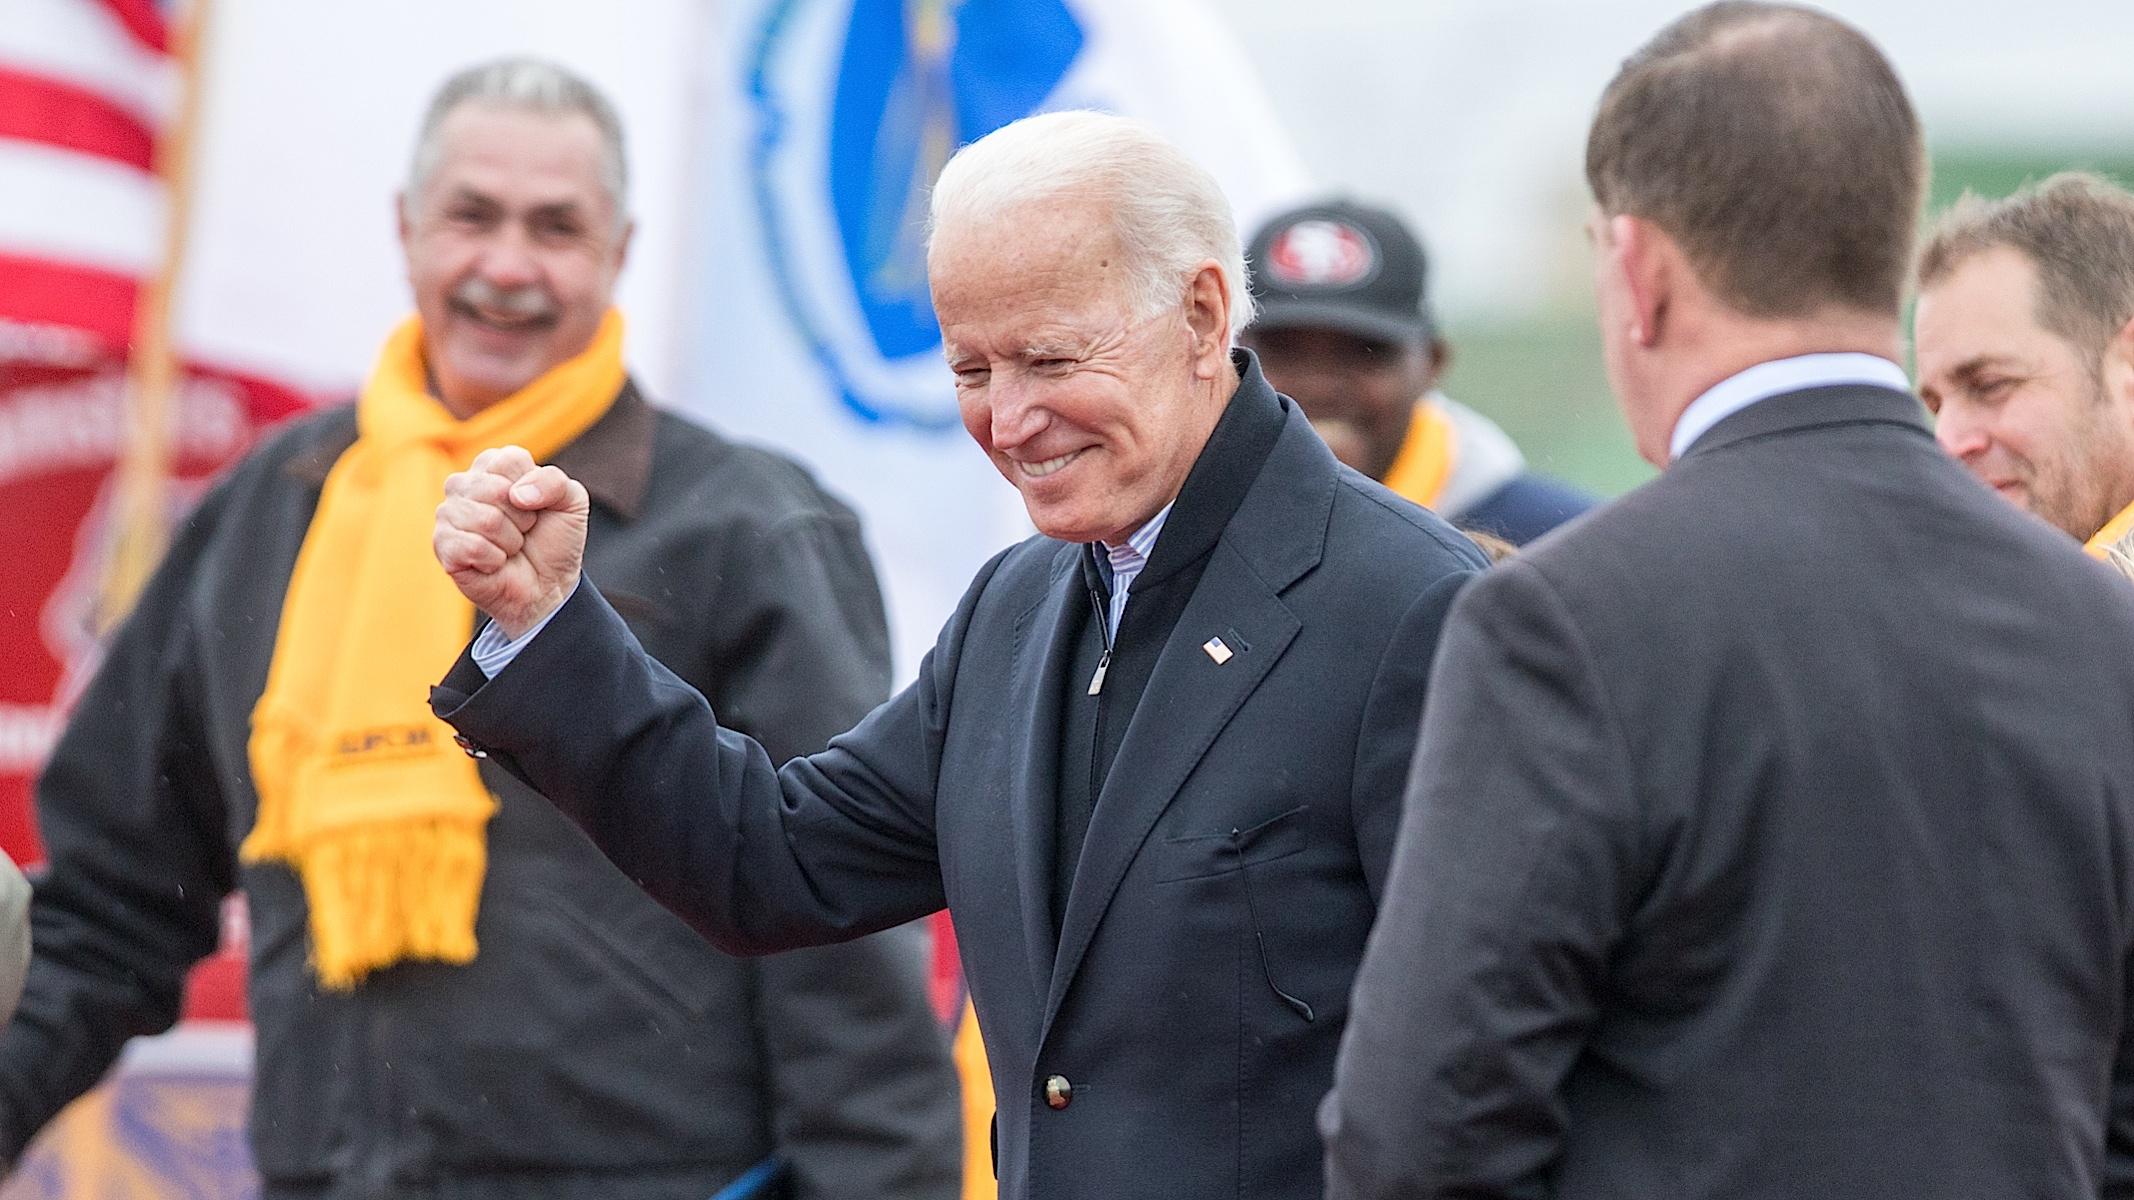 Only Joe Biden Can Take the Nomination From Joe Biden Now